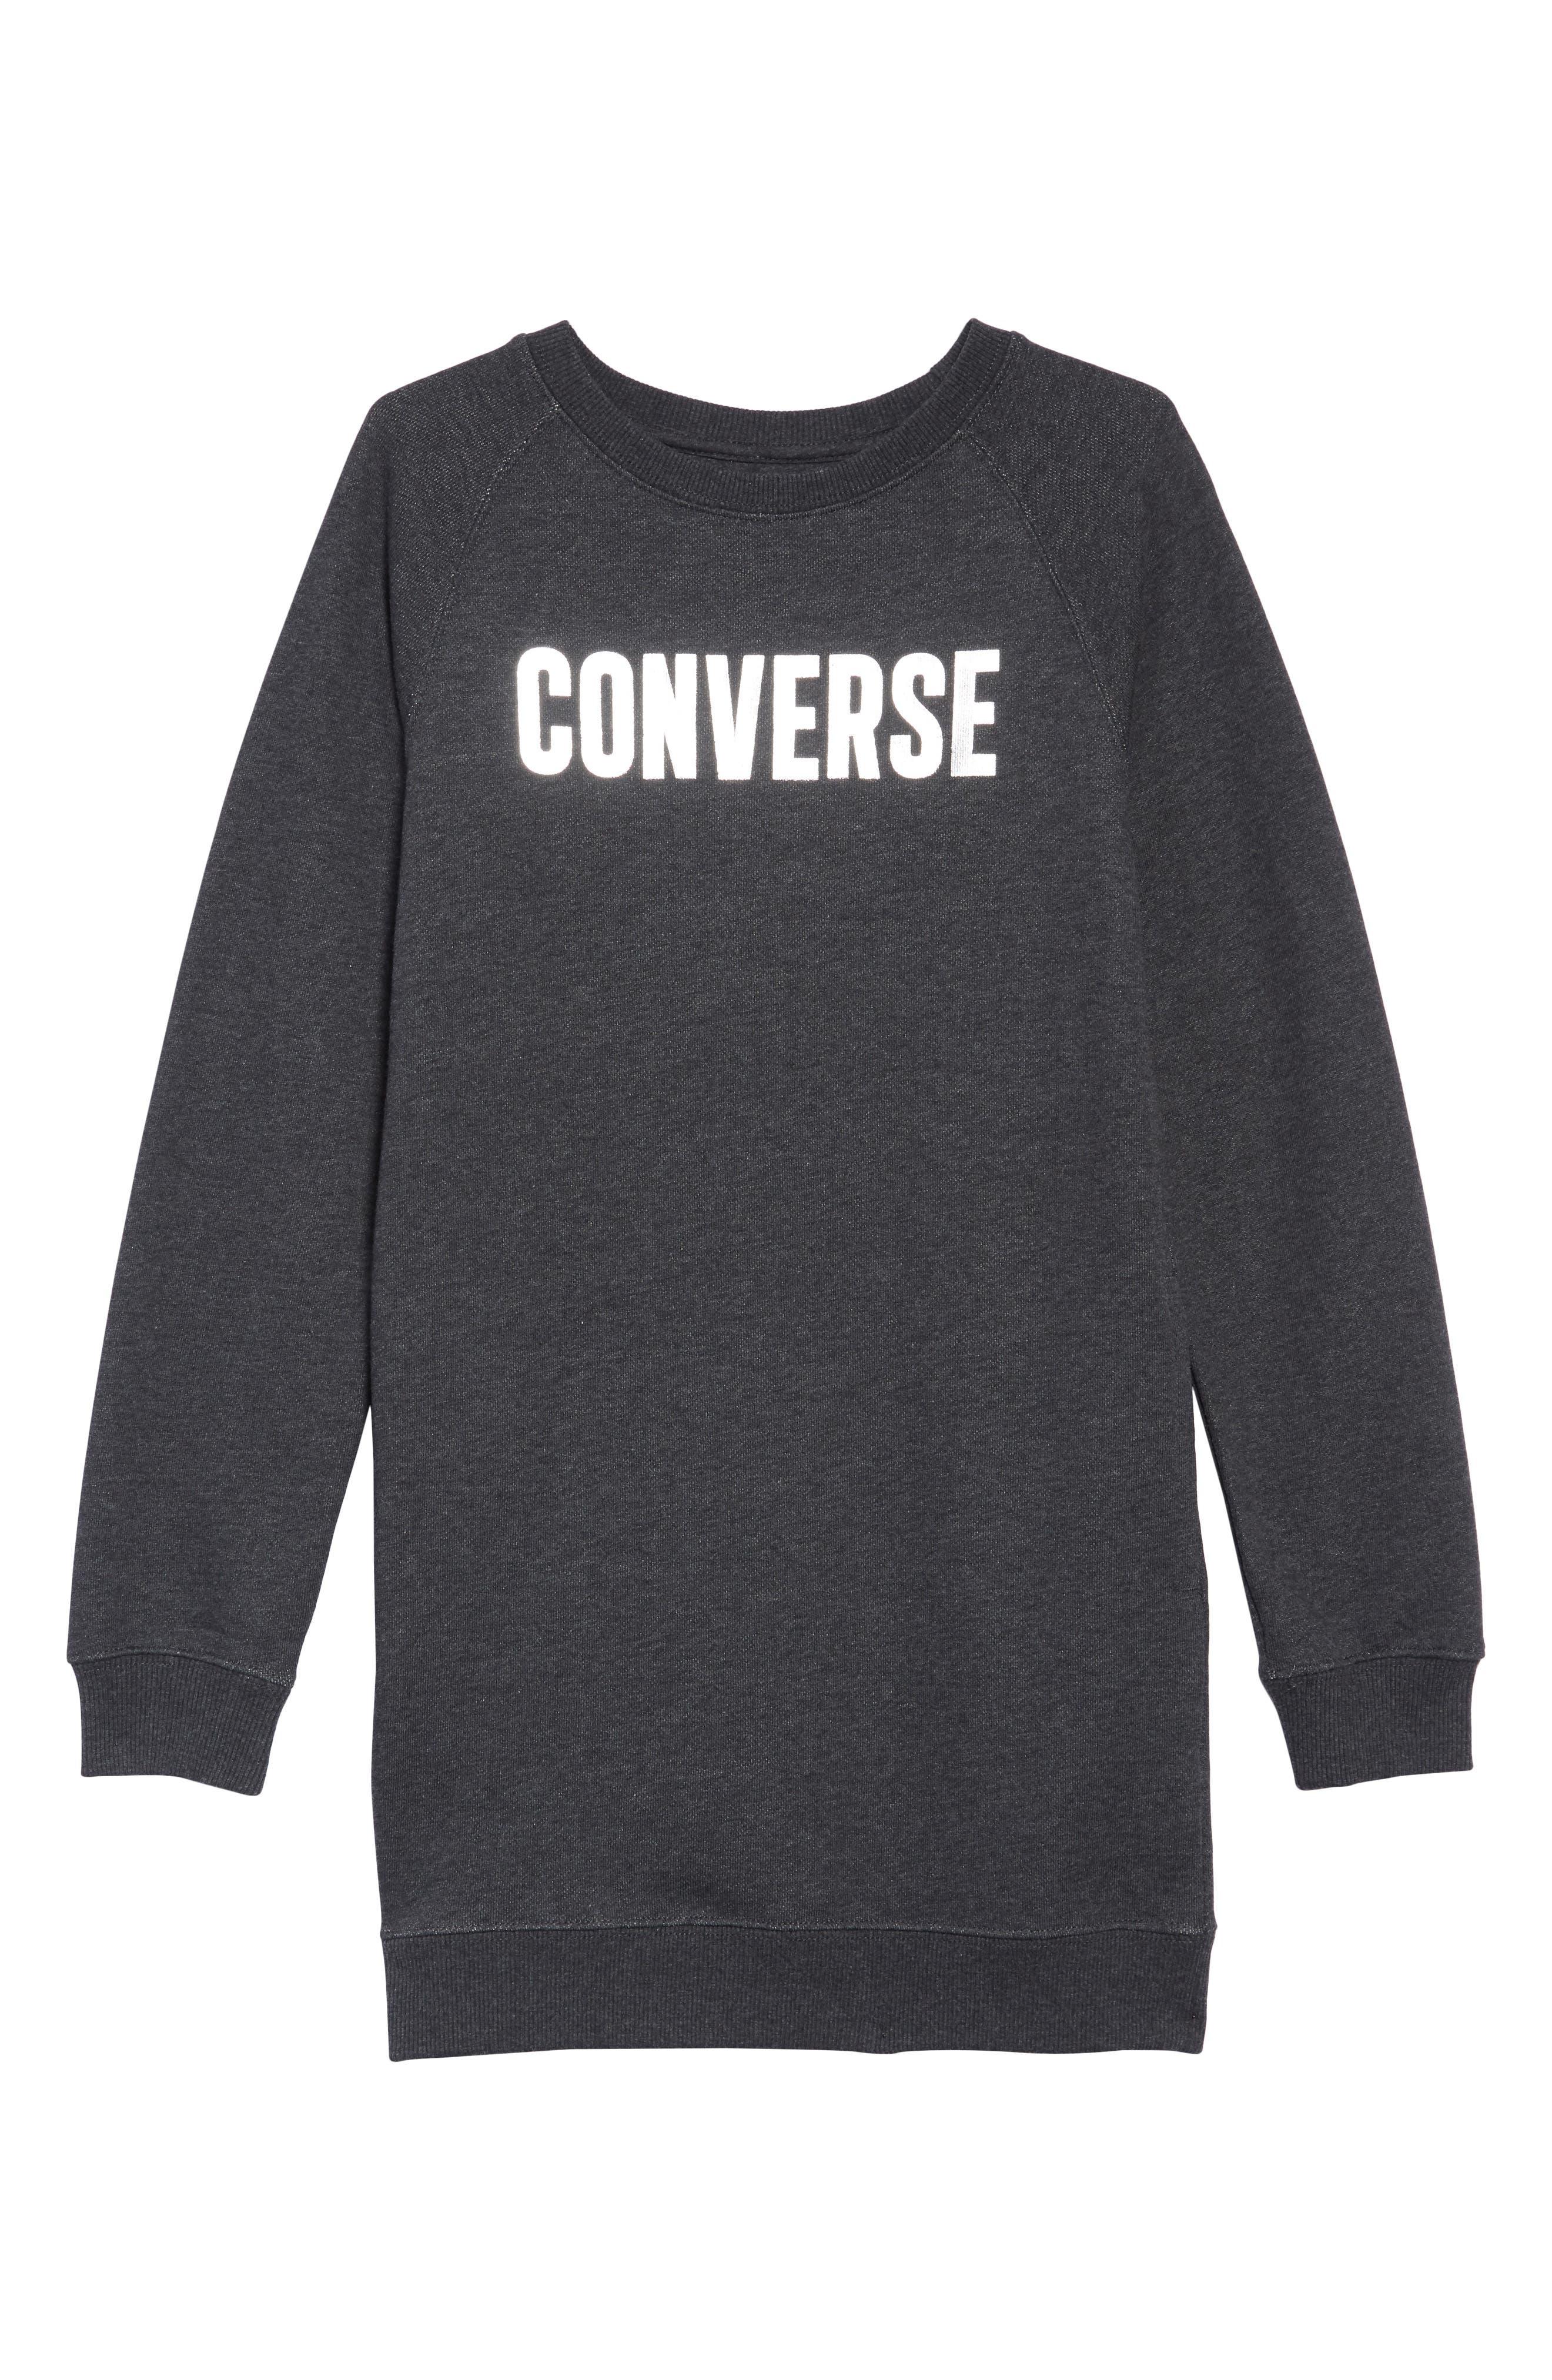 Sweatshirt Dress,                             Main thumbnail 1, color,                             BLACK HEATHER